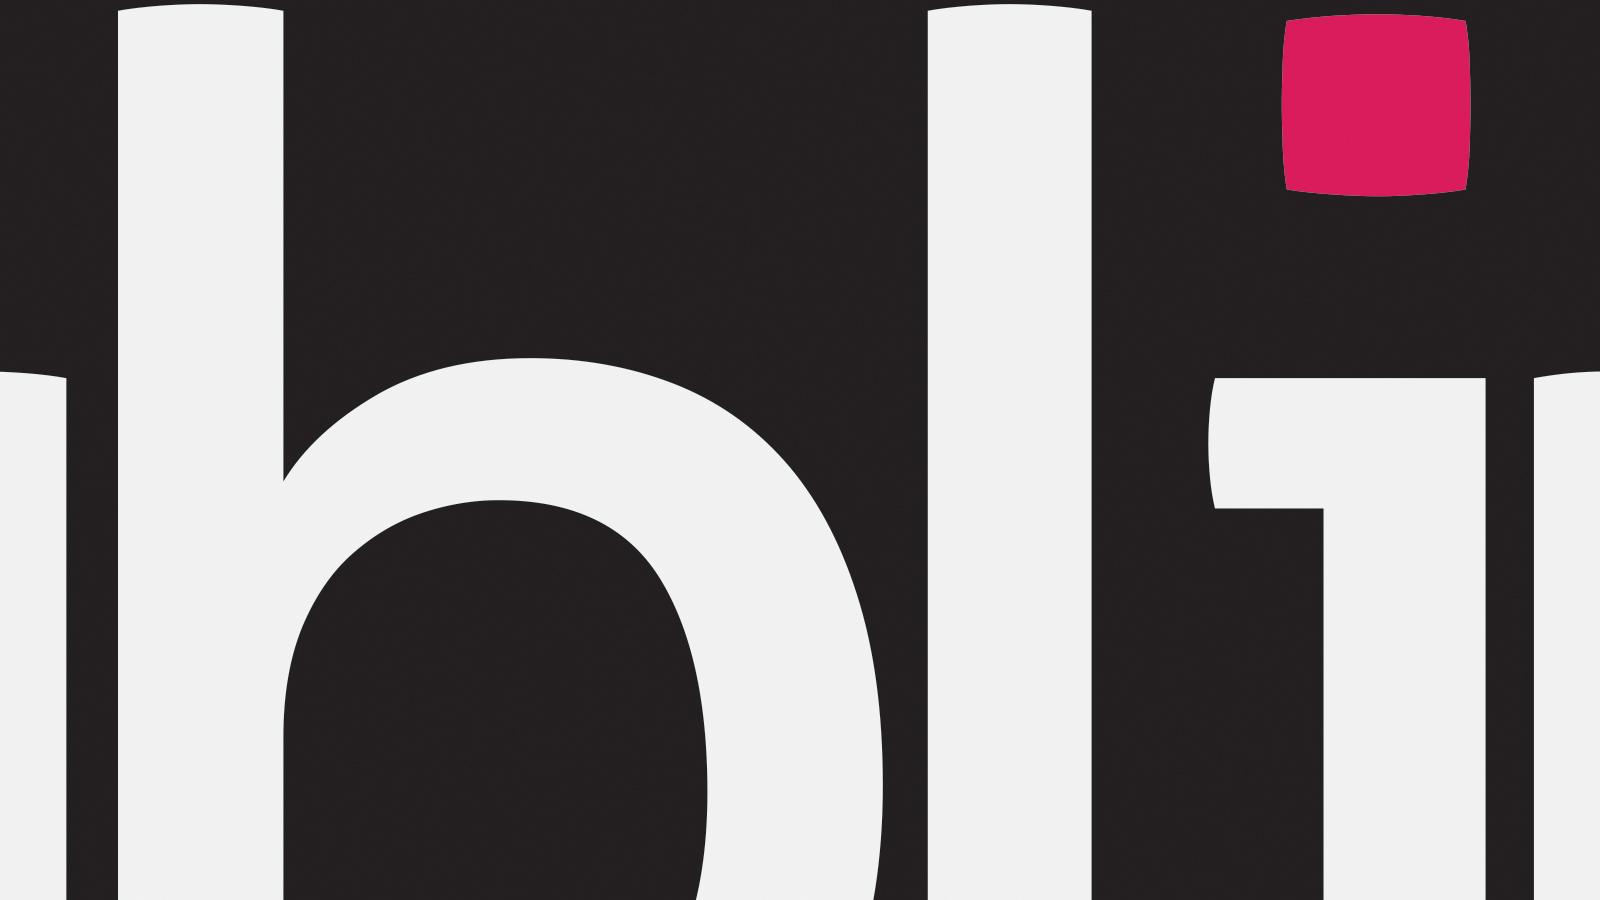 sublime-digital_sublime-digital-identity-02